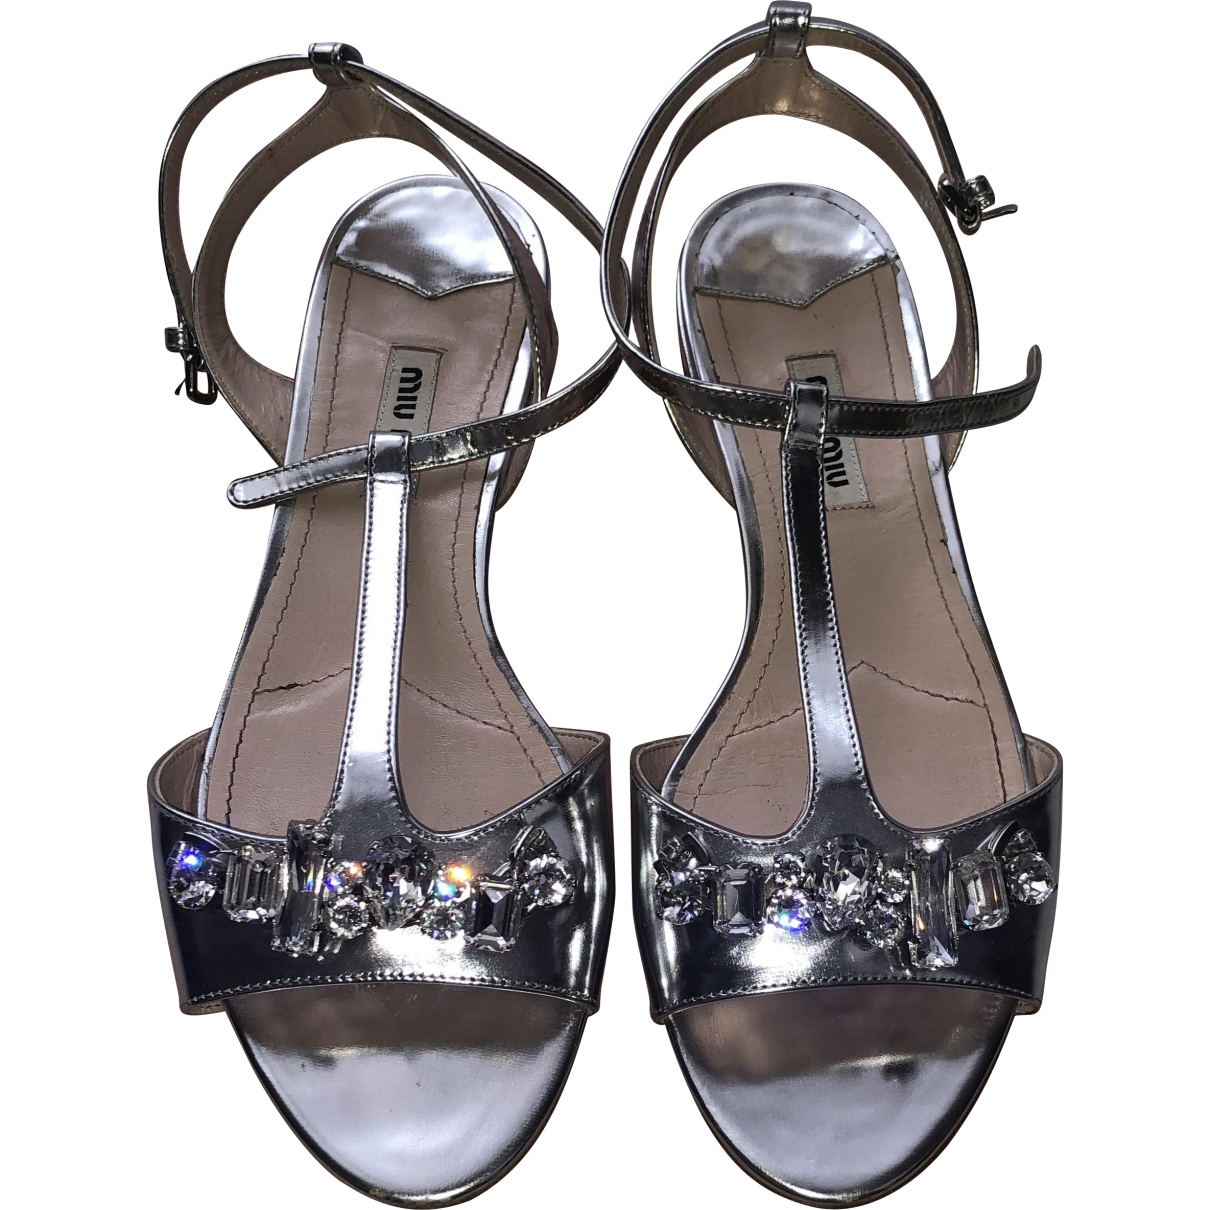 Miu Miu \N Metallic Leather Sandals for Women 37.5 EU